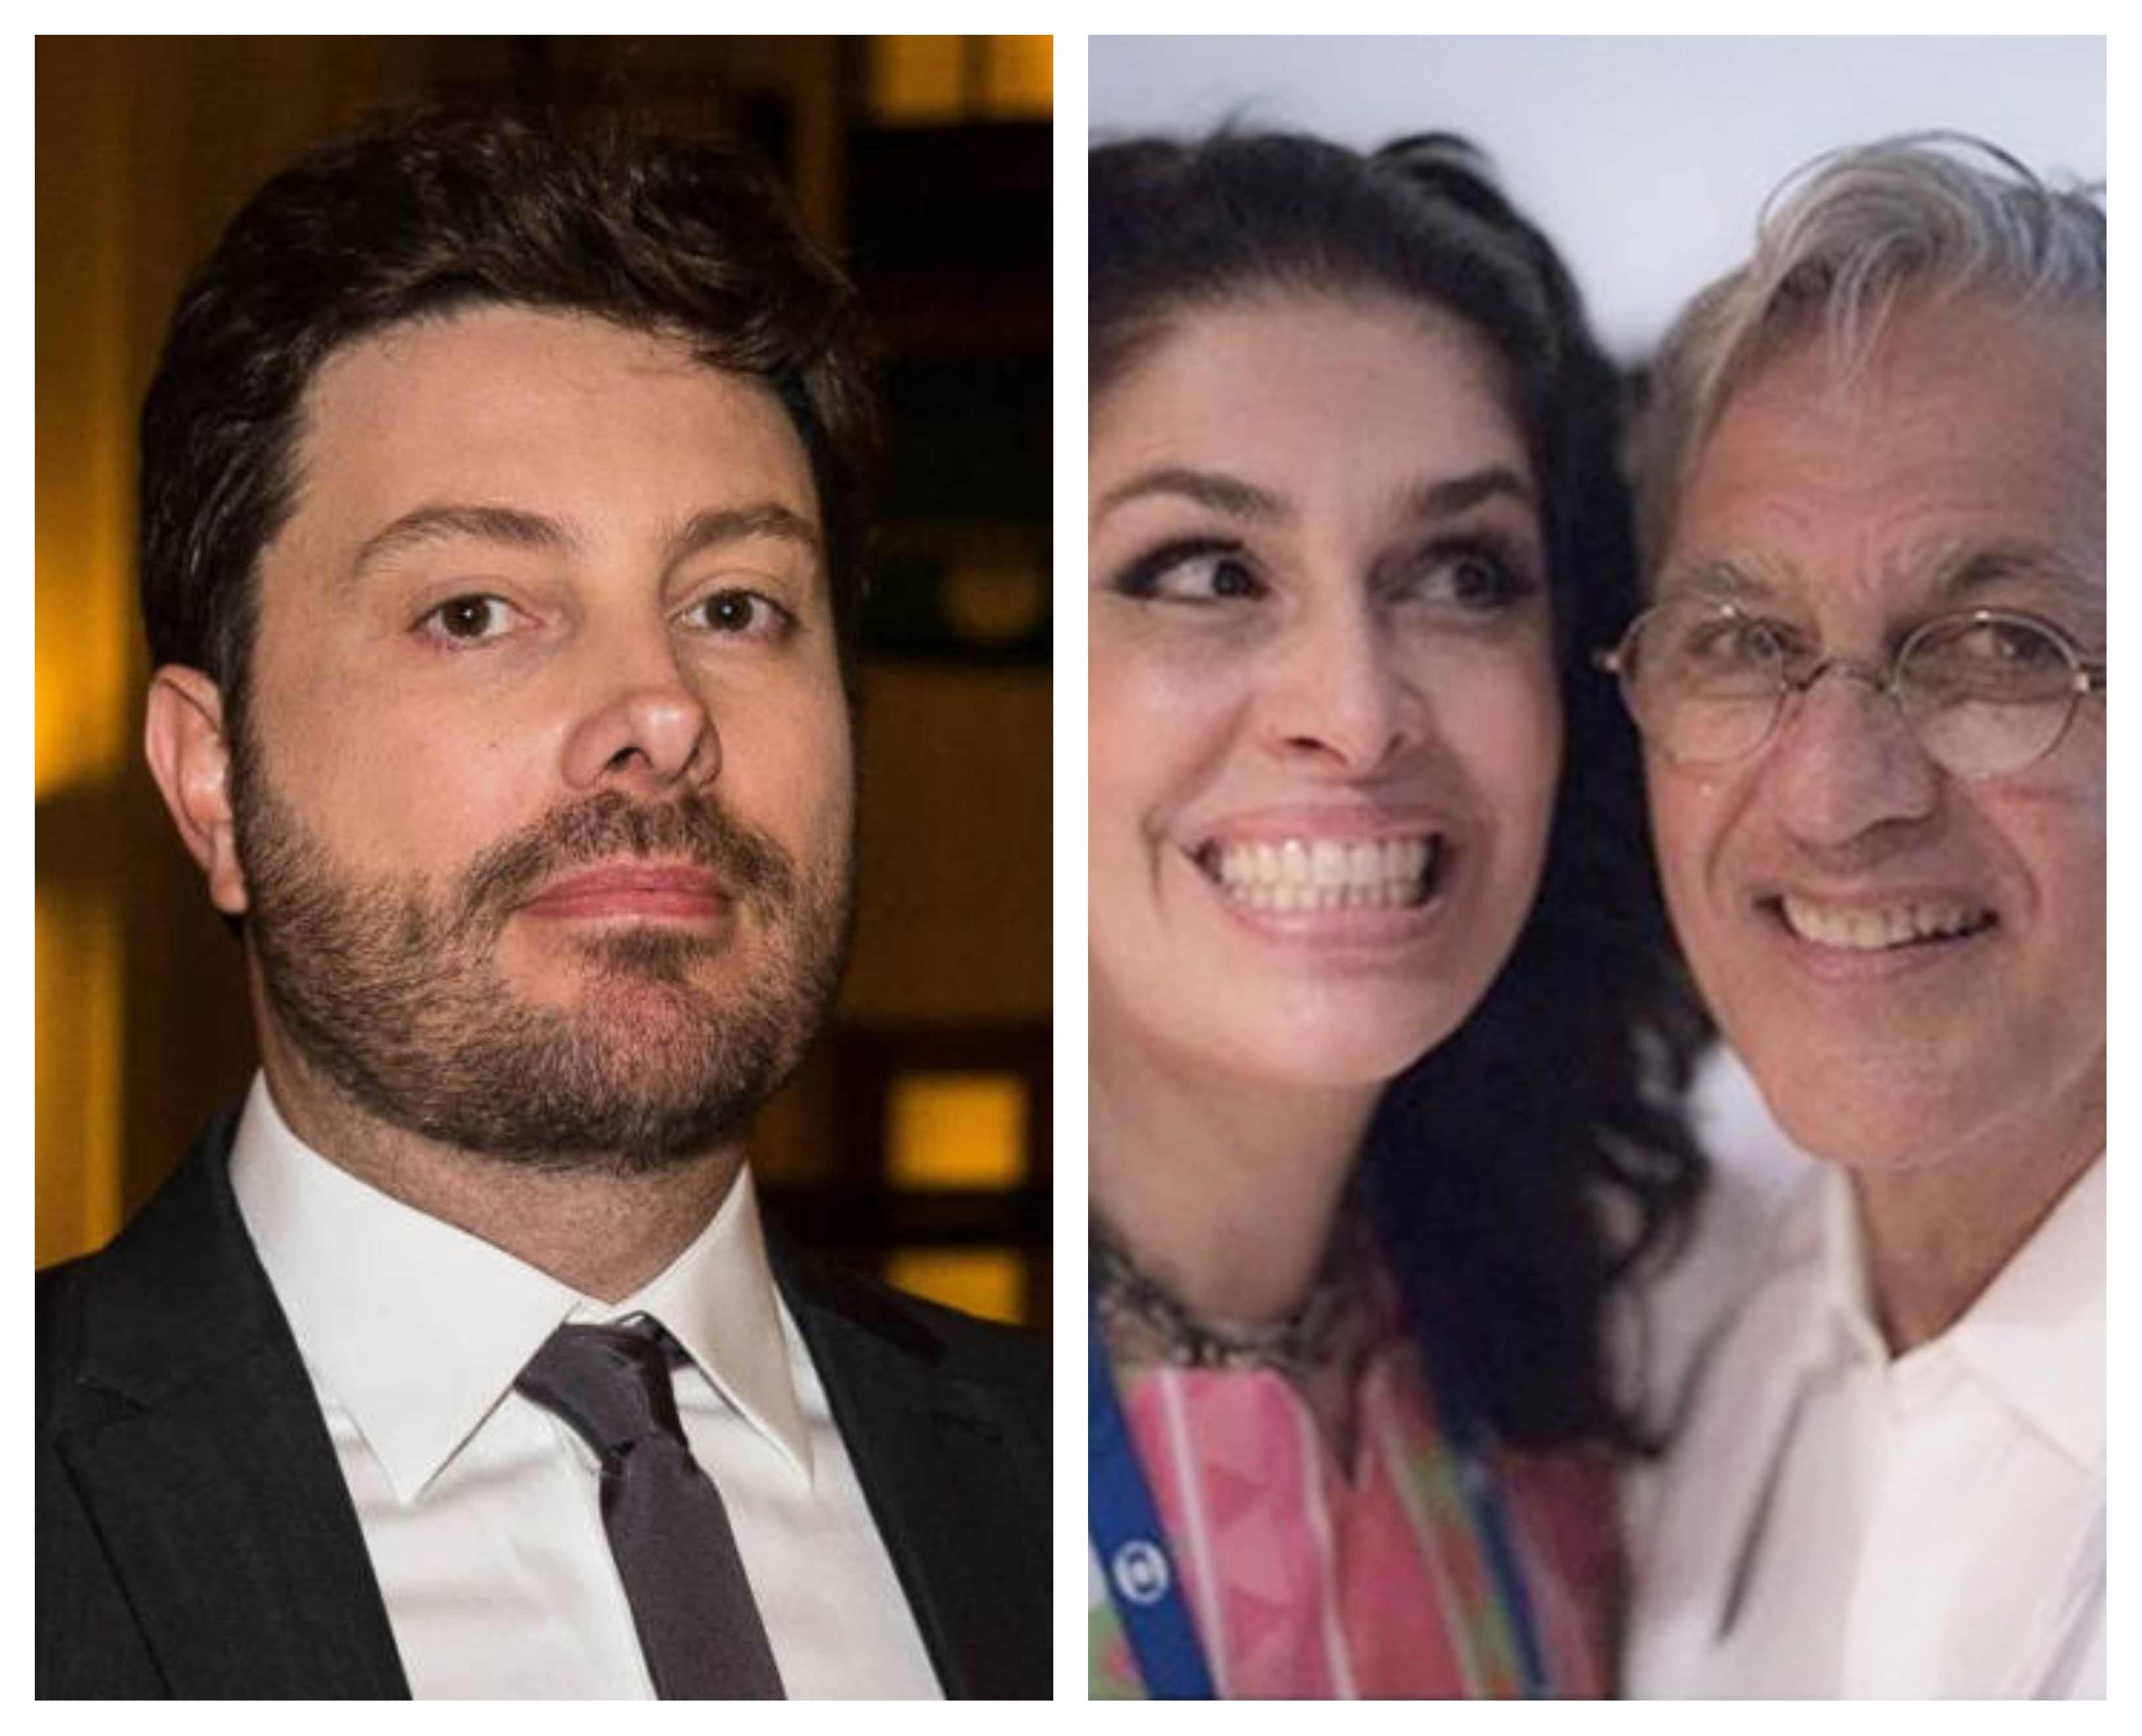 5c54e7575 Caetano Veloso e Paula Lavigne comemoram prisão de Danilo Gentili ...